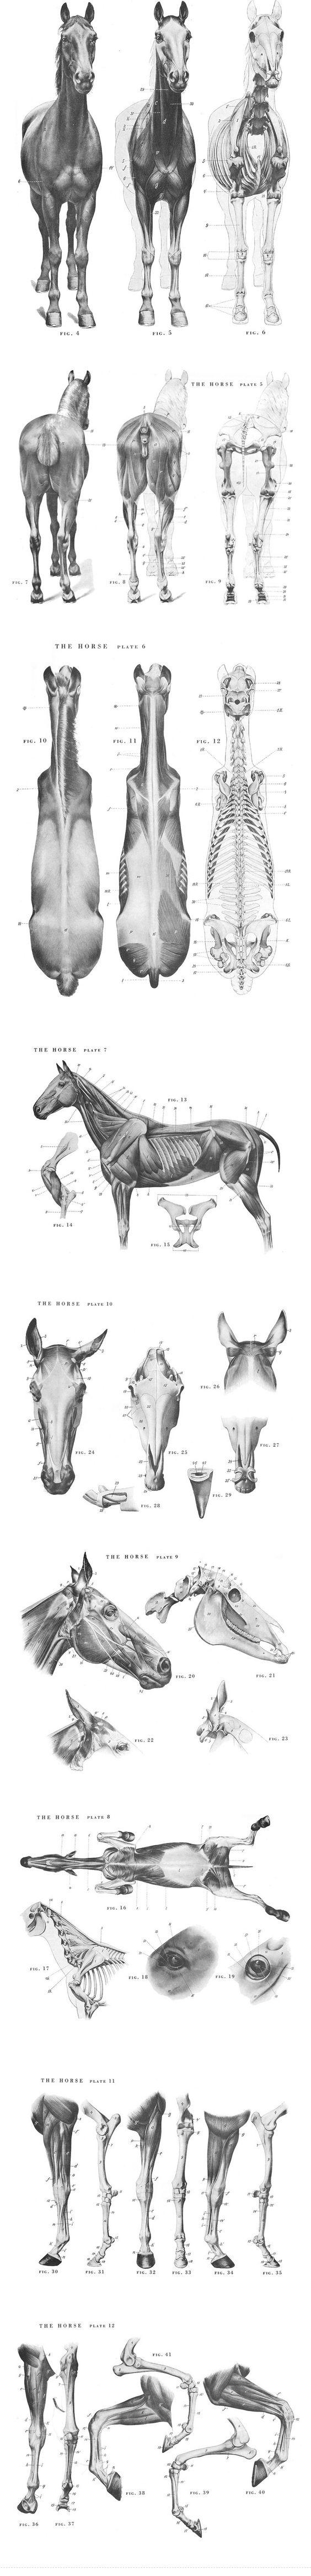 kuhles fruehlingspraesente fuer sinne und seele am besten bild oder cfbfaeafdfbf horse anatomy study horses anatomy